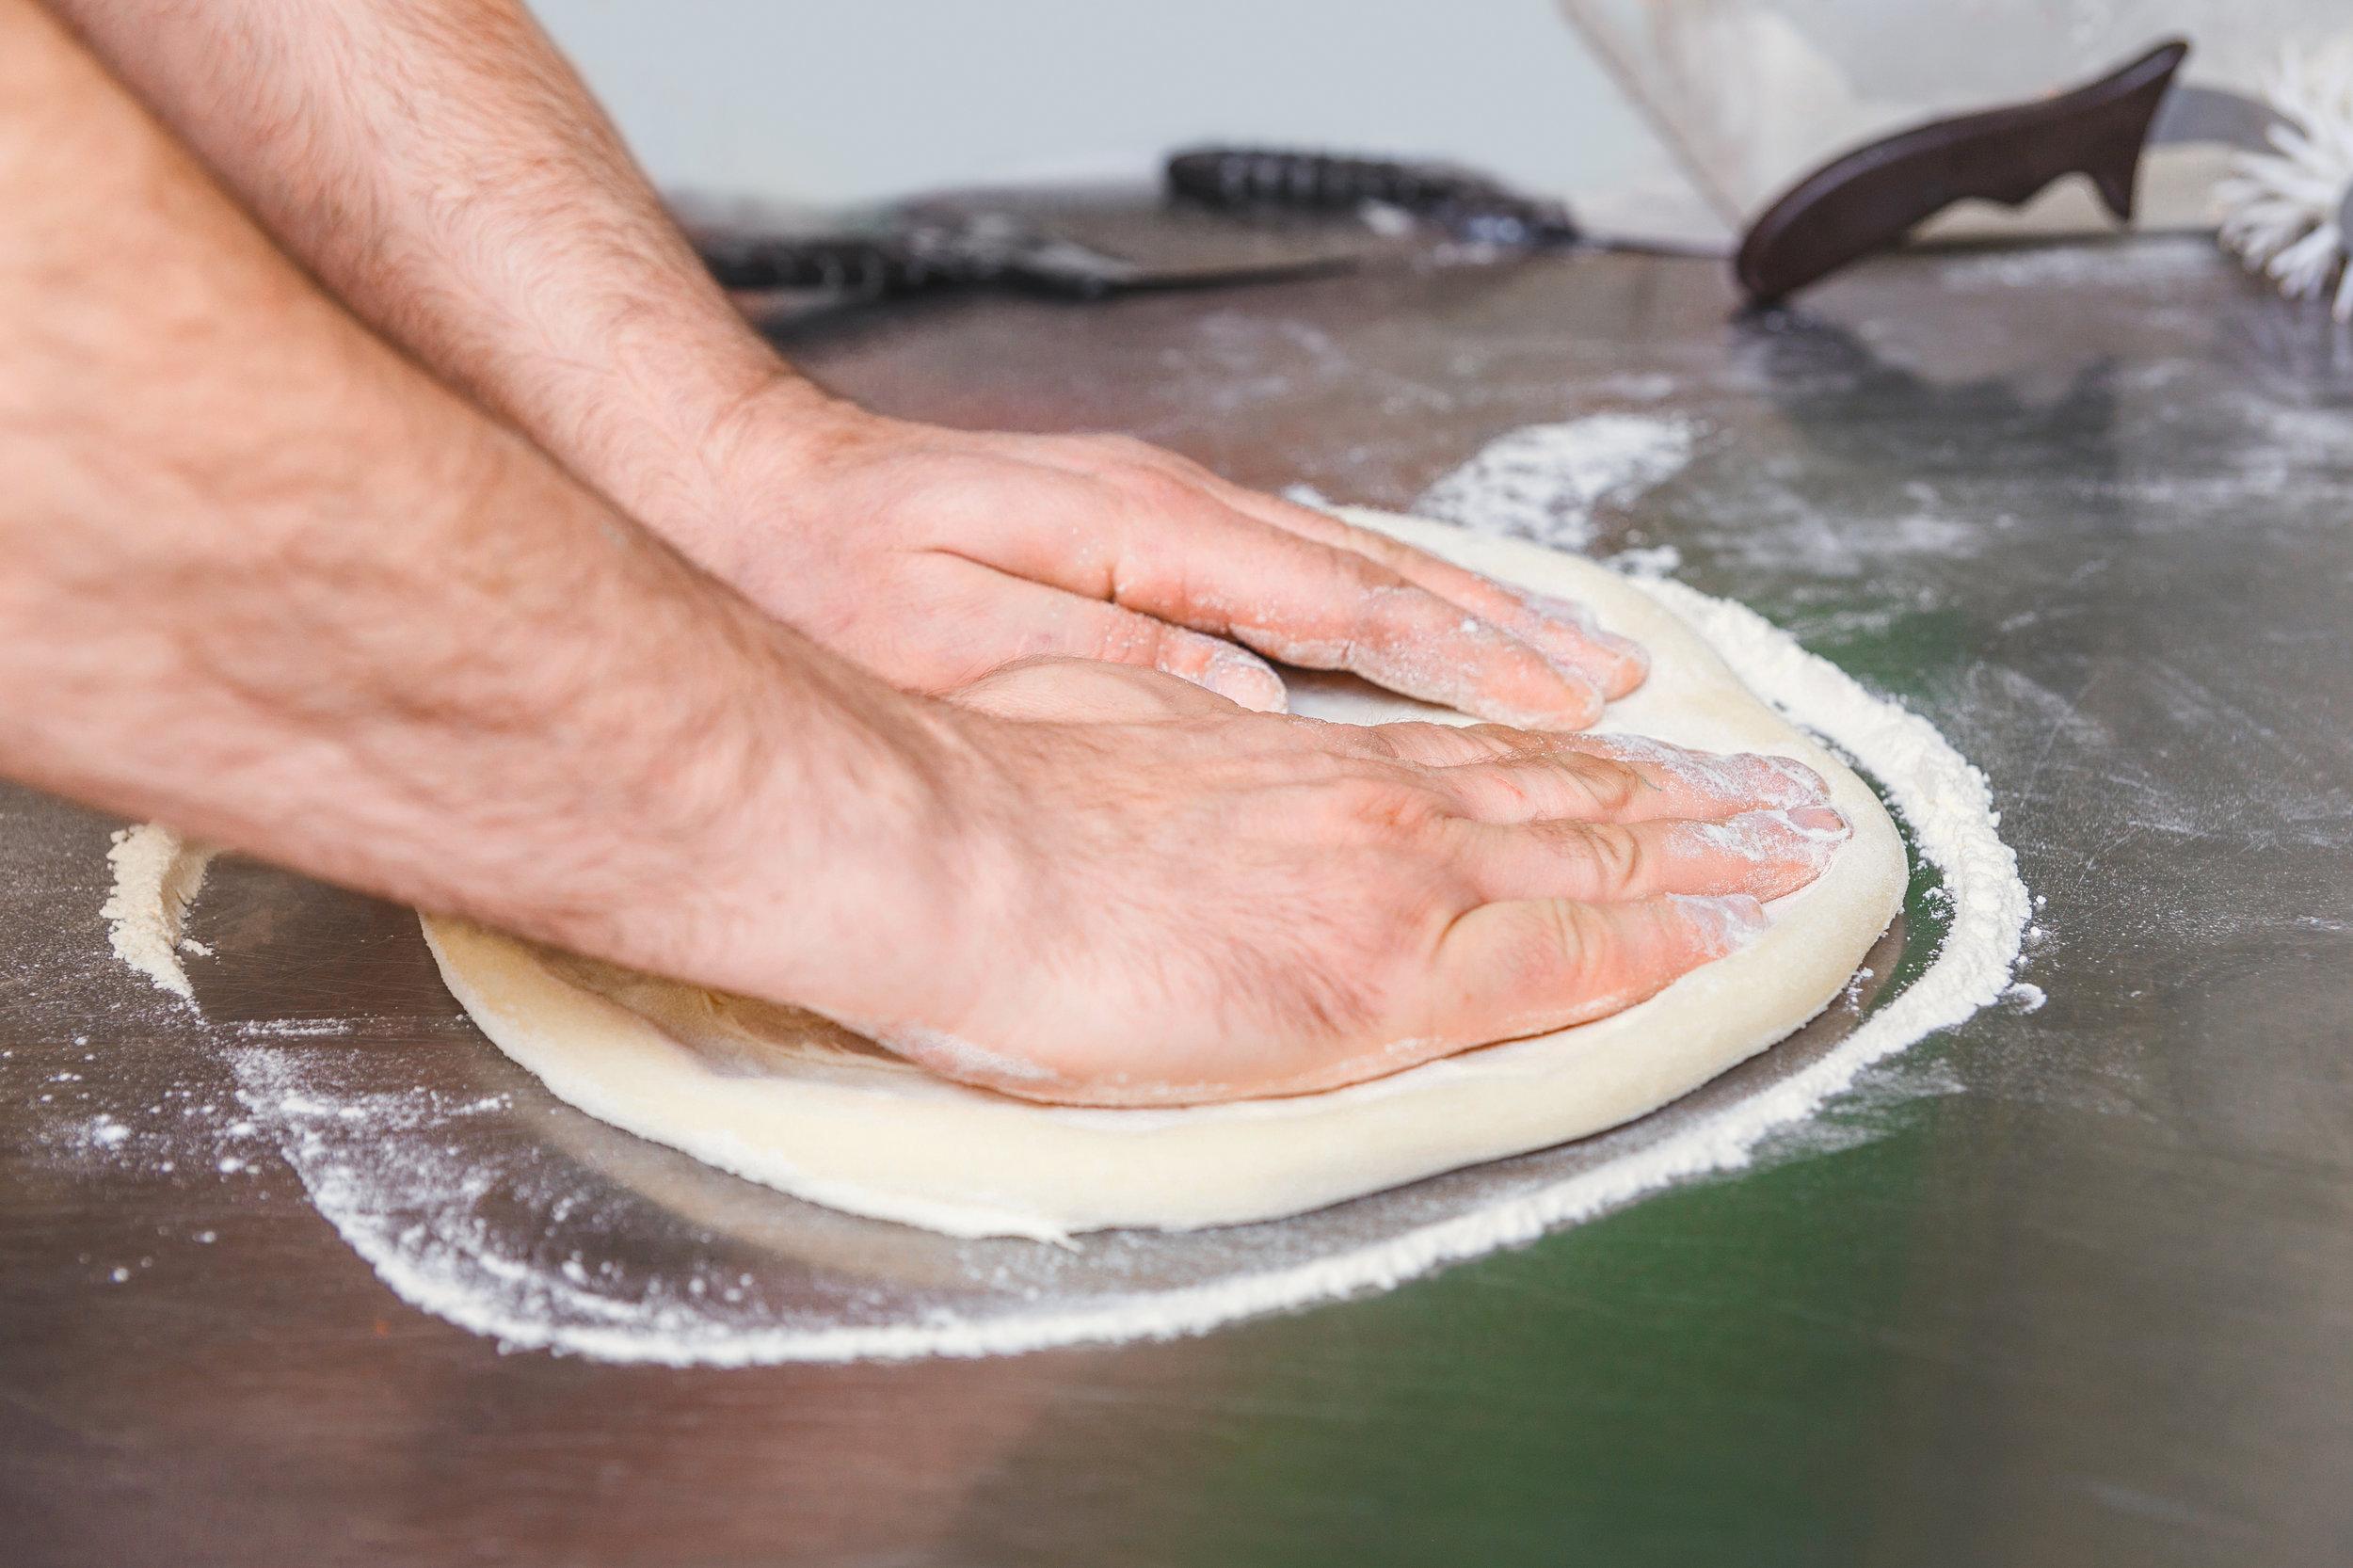 bigstock-Cook-Forms-A-Dough-Pizza-Base-173400365.jpg